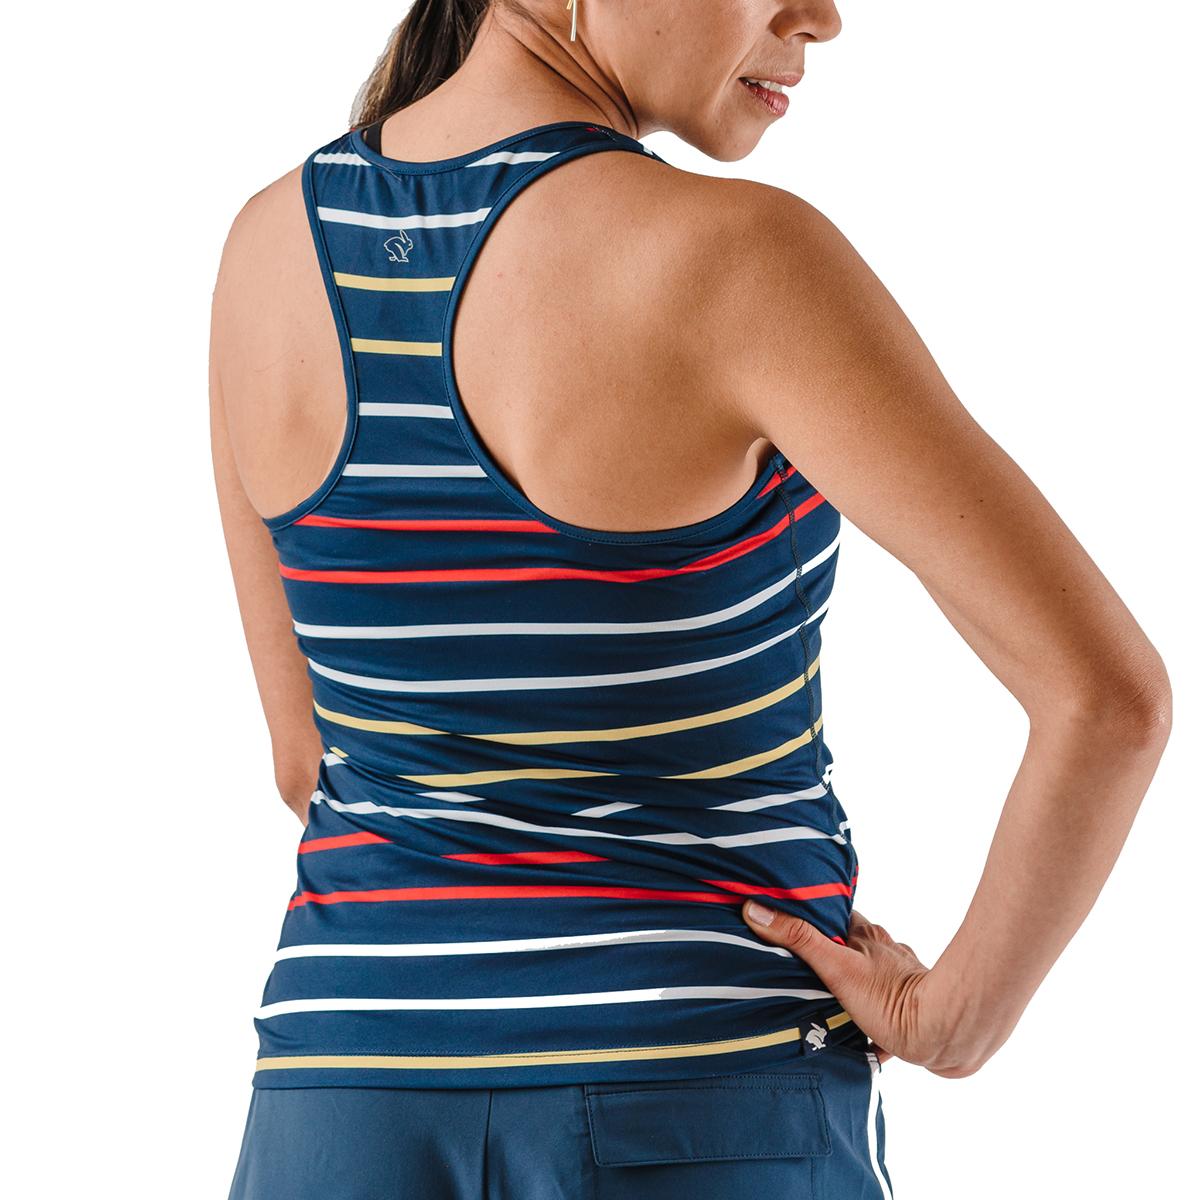 Women's Rabbit Bunny Hop Tank - Color: Dress Blues Stripe - Size: XS, Dress Blues Stripe, large, image 2